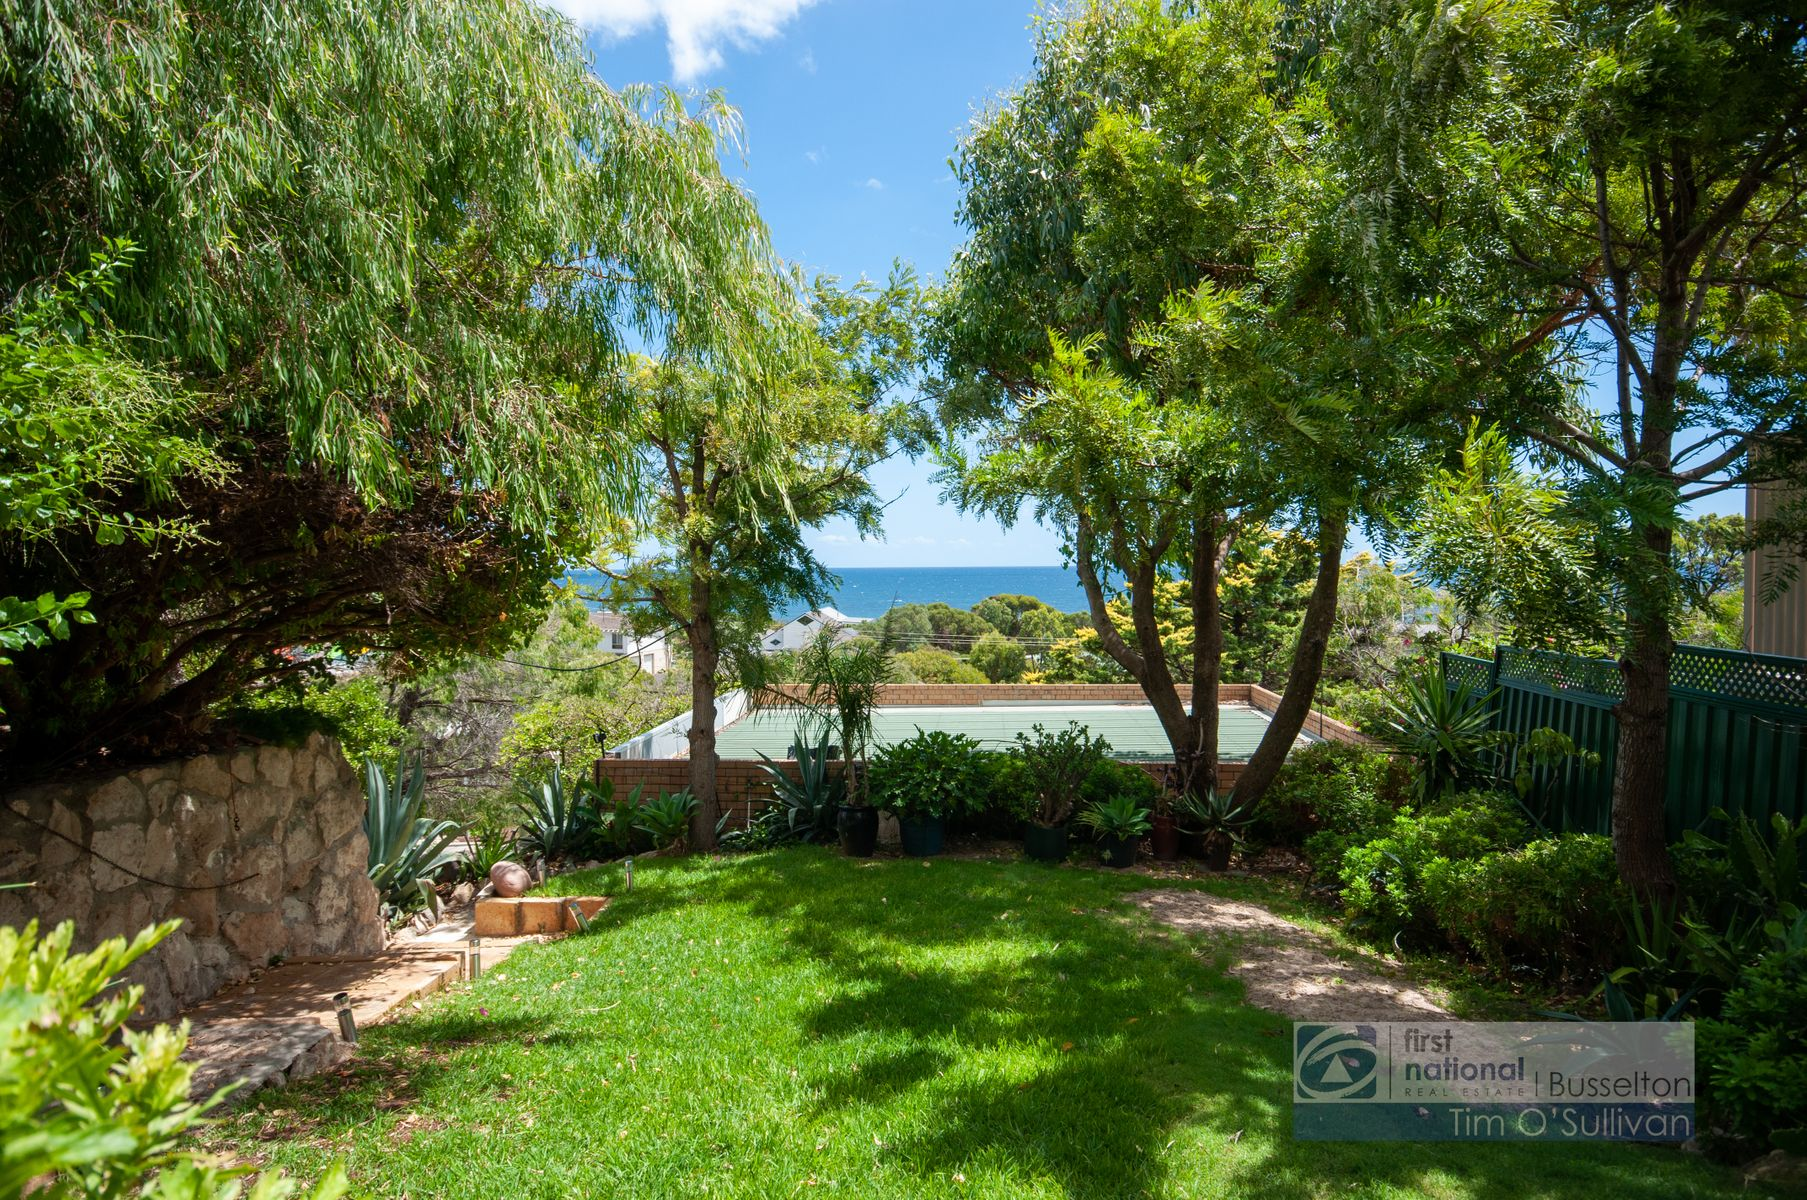 12 Peppermint Grove Terrace, Peppermint Grove Beach, WA 6271